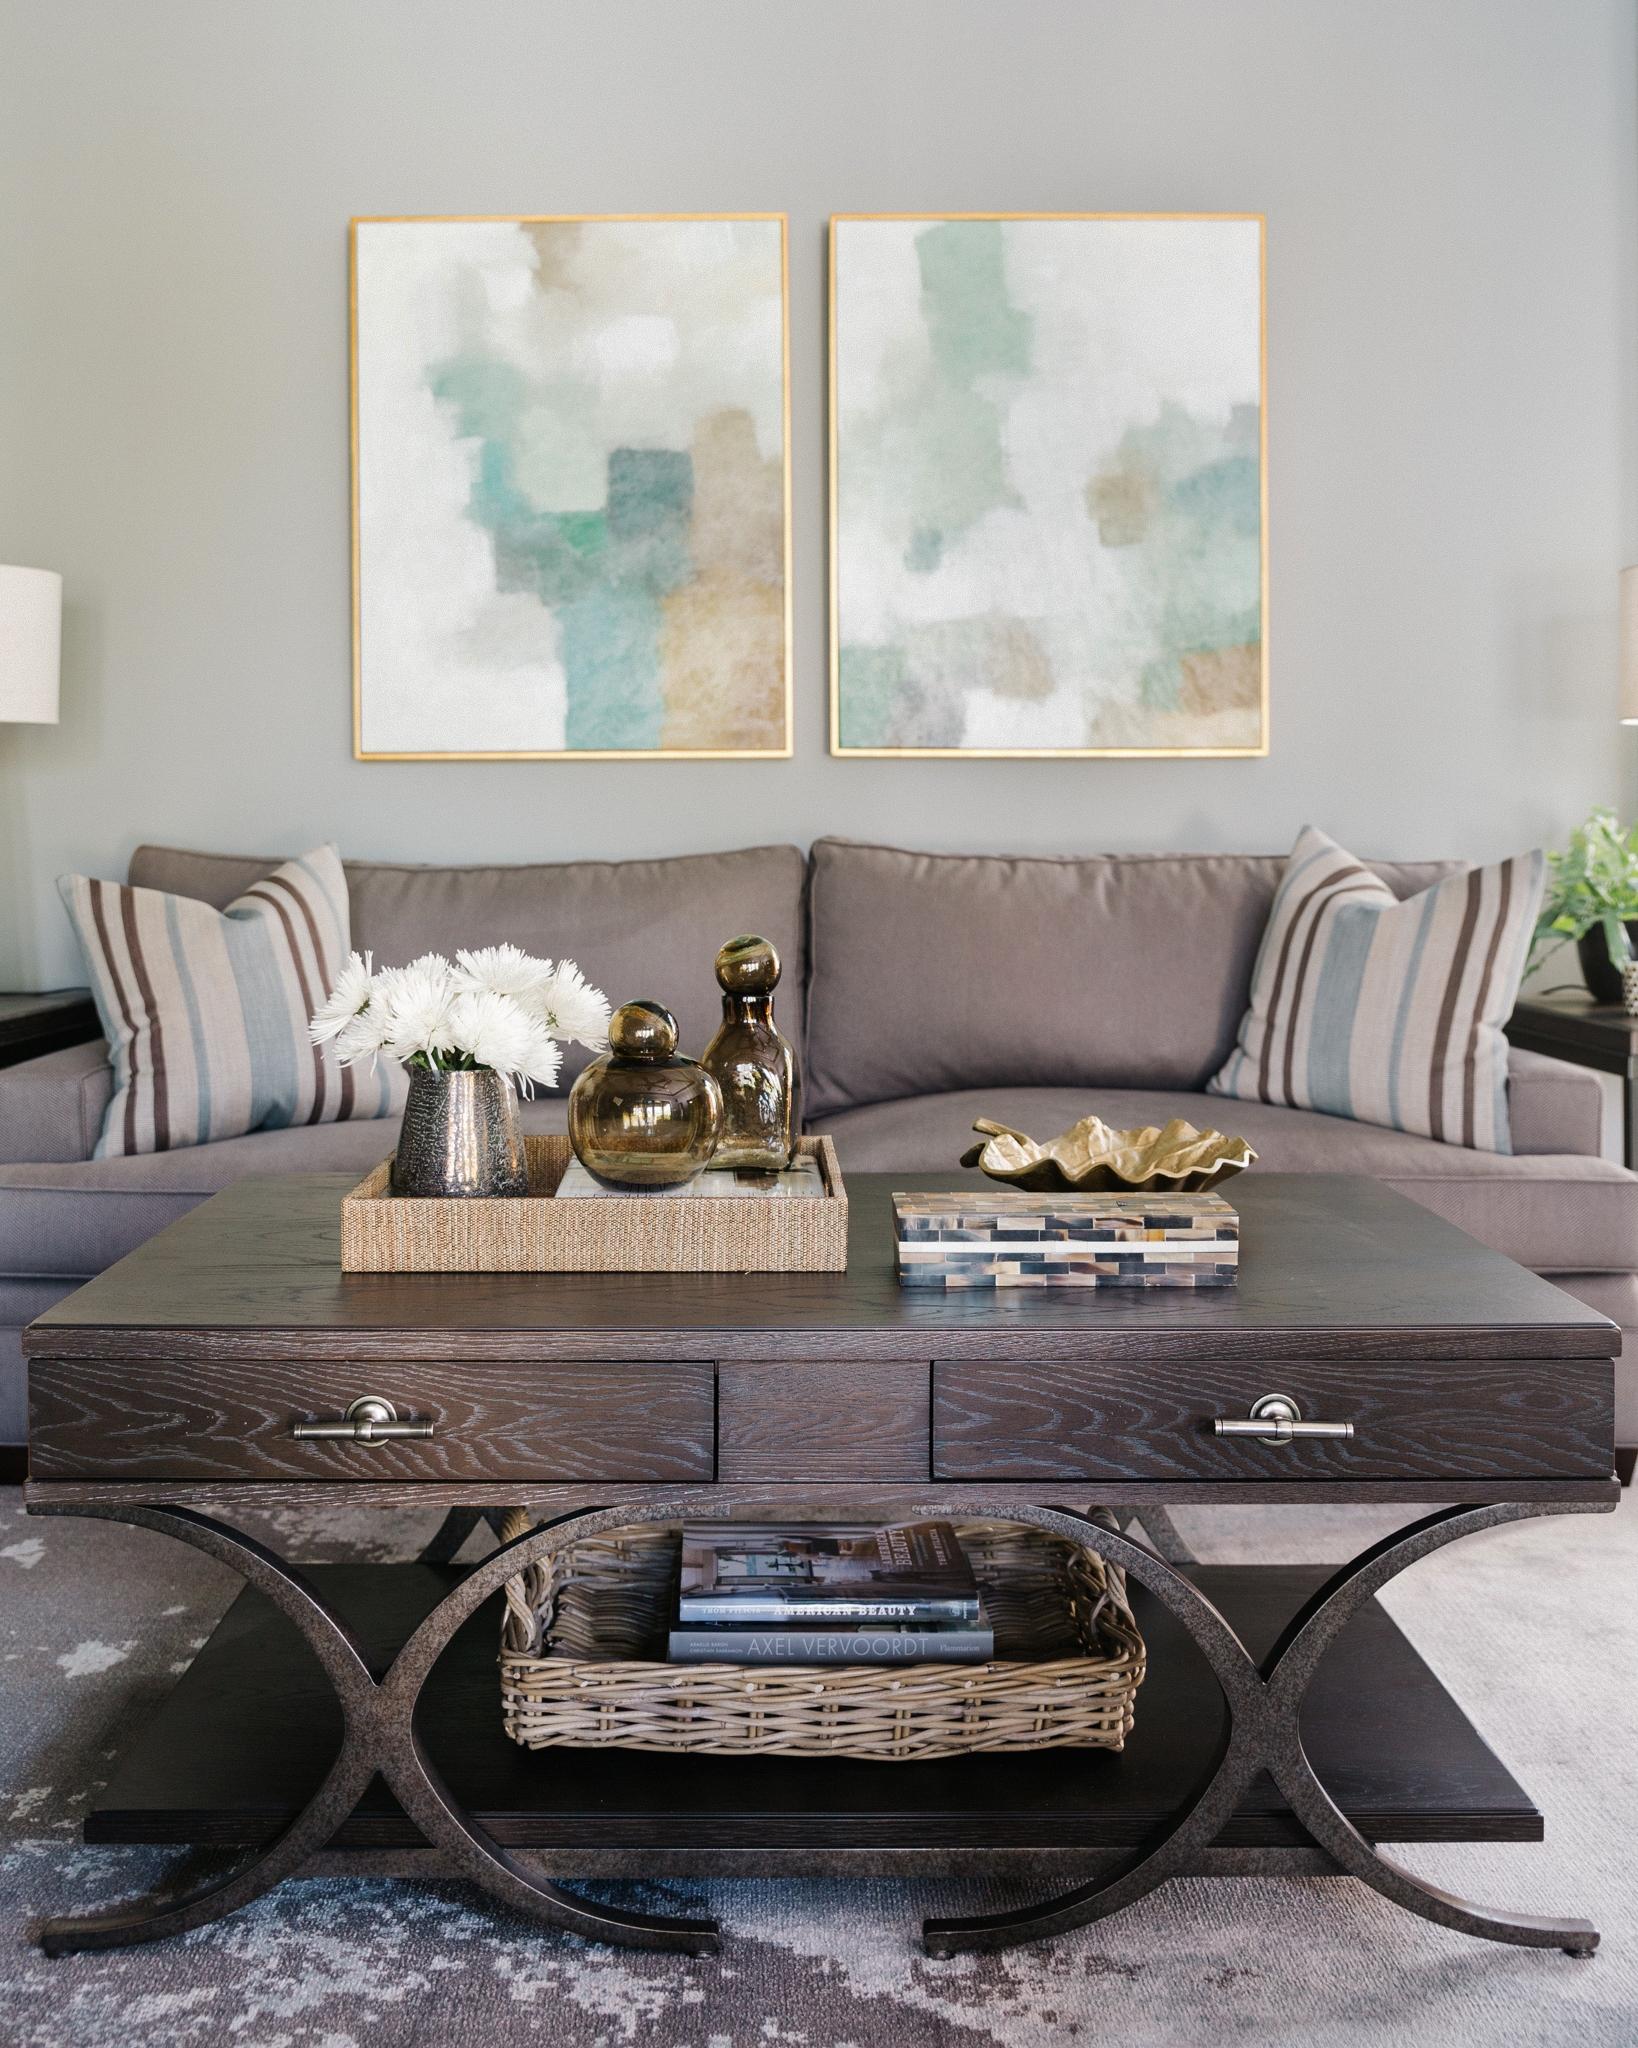 Project Reveal - Family room, backyard oasis, breakfast room | Carla Aston, Designer | Colleen Scott, Photographer | #familyroom #familyroomideas #coffeetablestyling